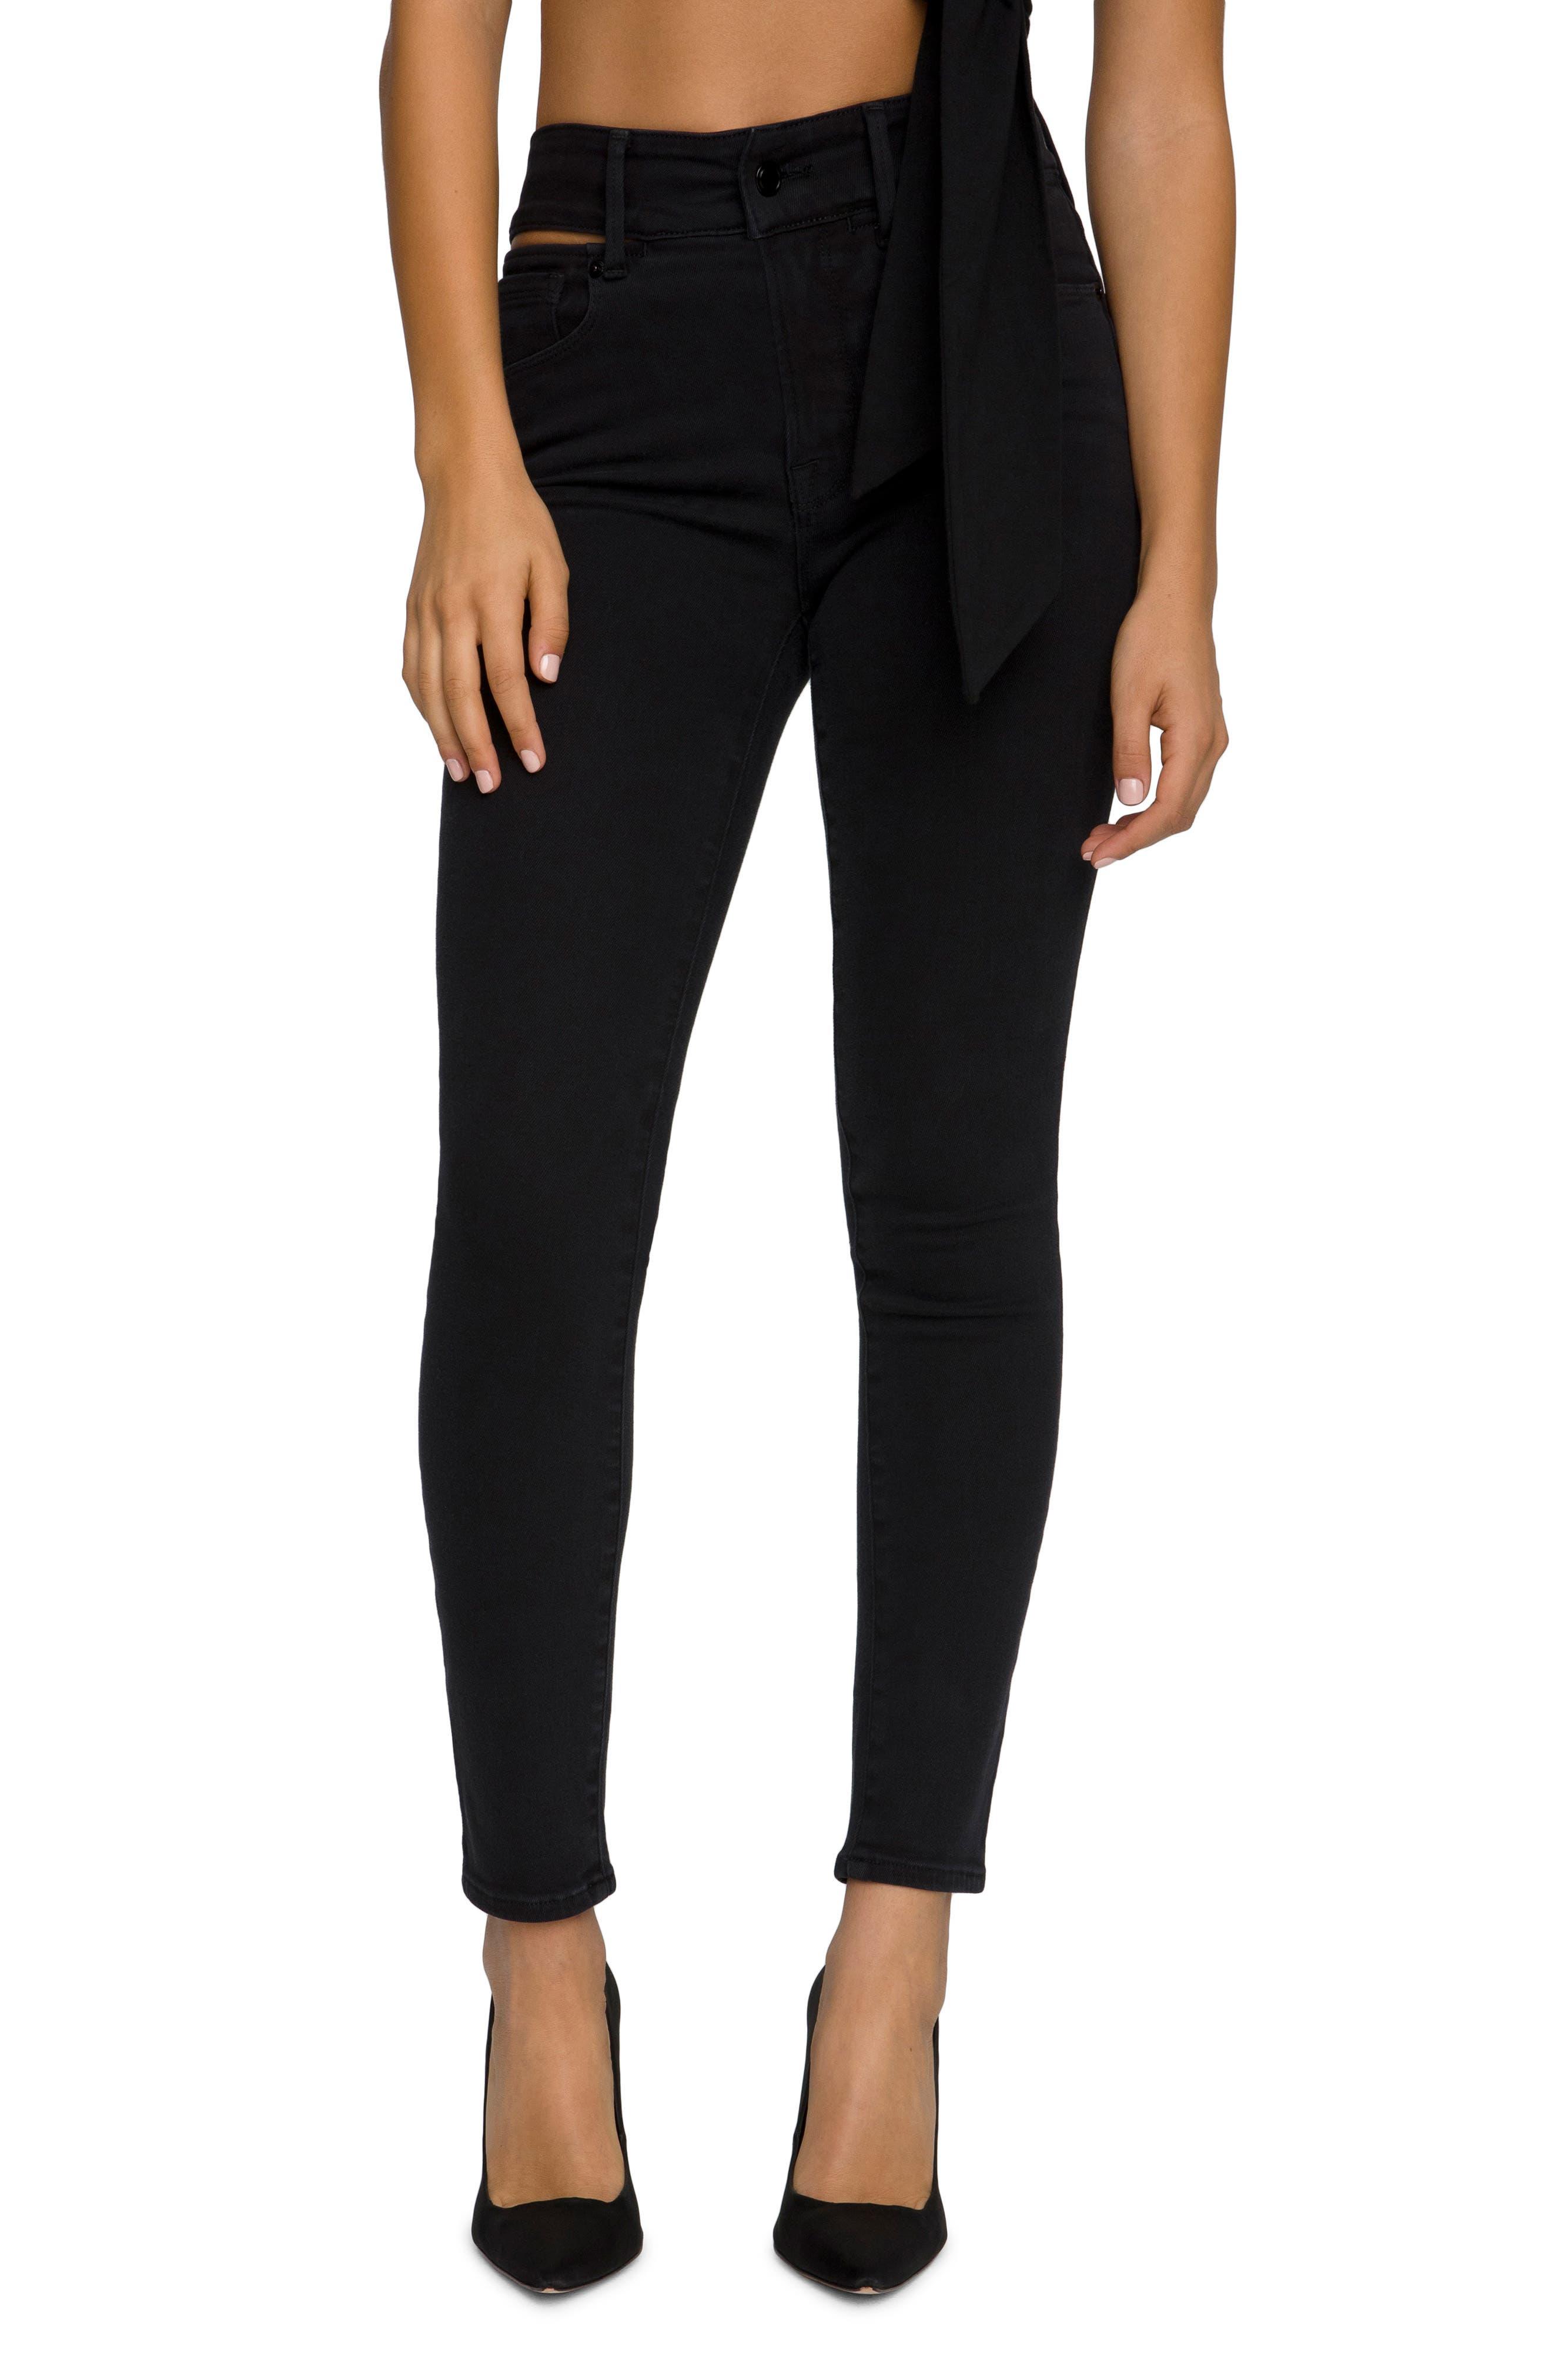 Women's Good American Good Legs Slit Waistband Ankle Skinny Jeans